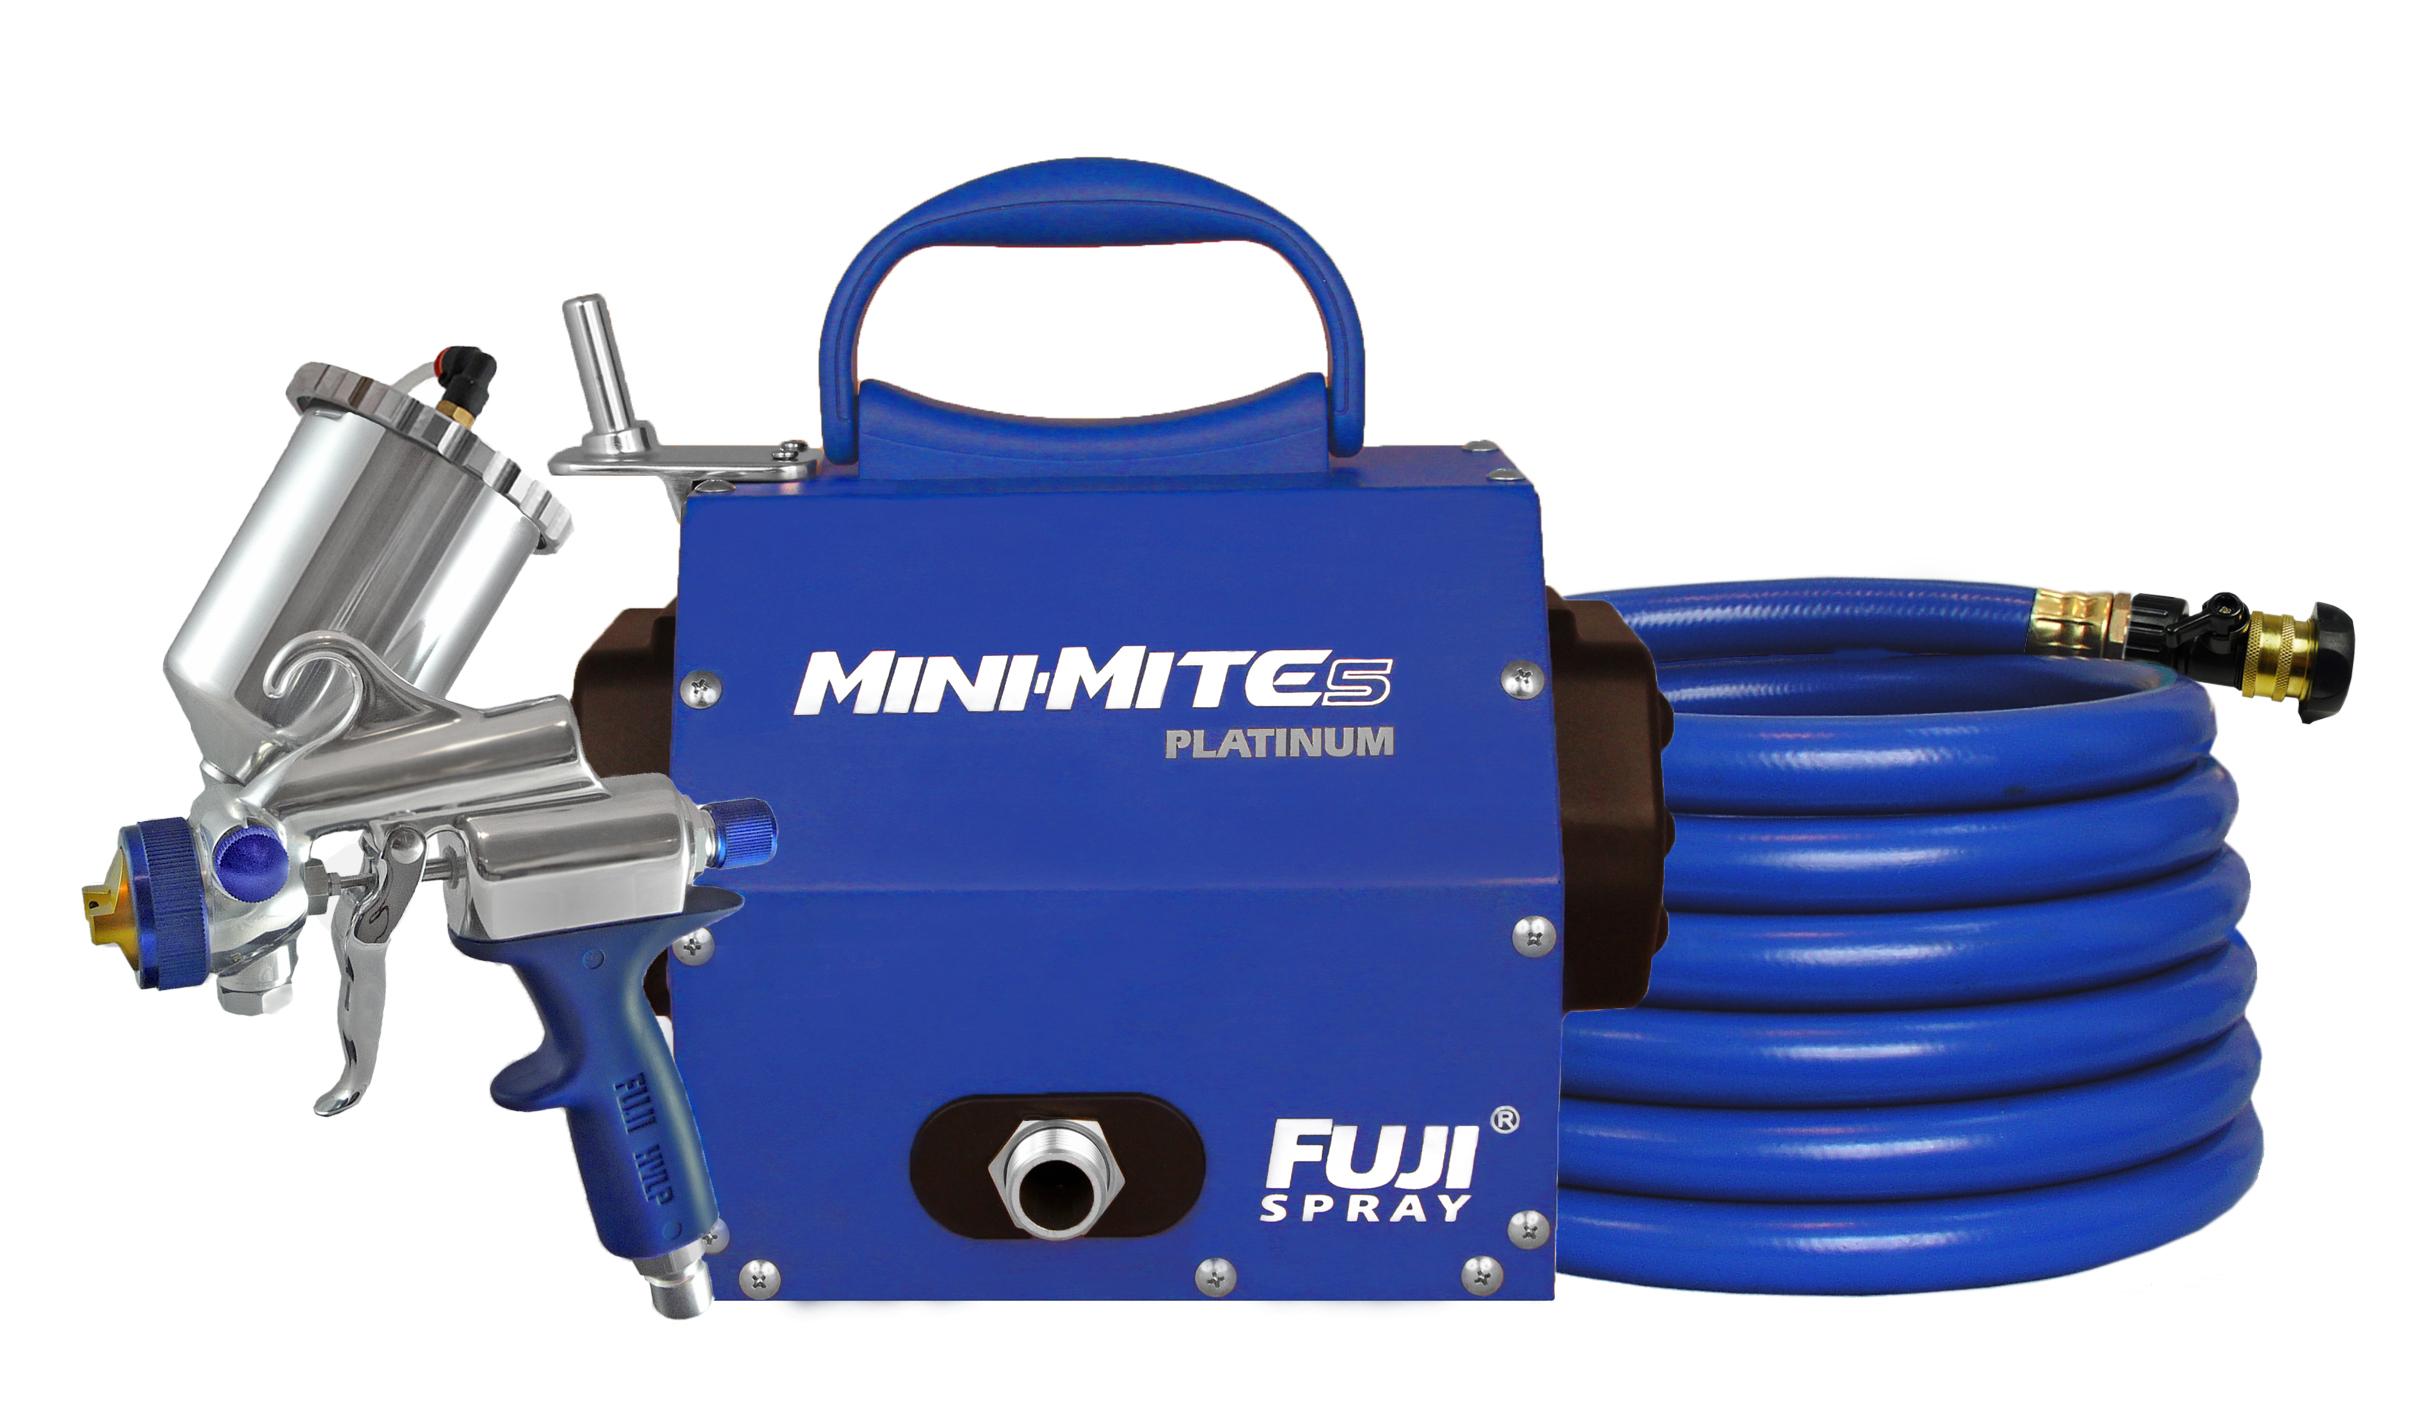 Fuji Spray Mini-Mite 5 Platinum-GXPC   COGENT COATINGS Bathtub ...